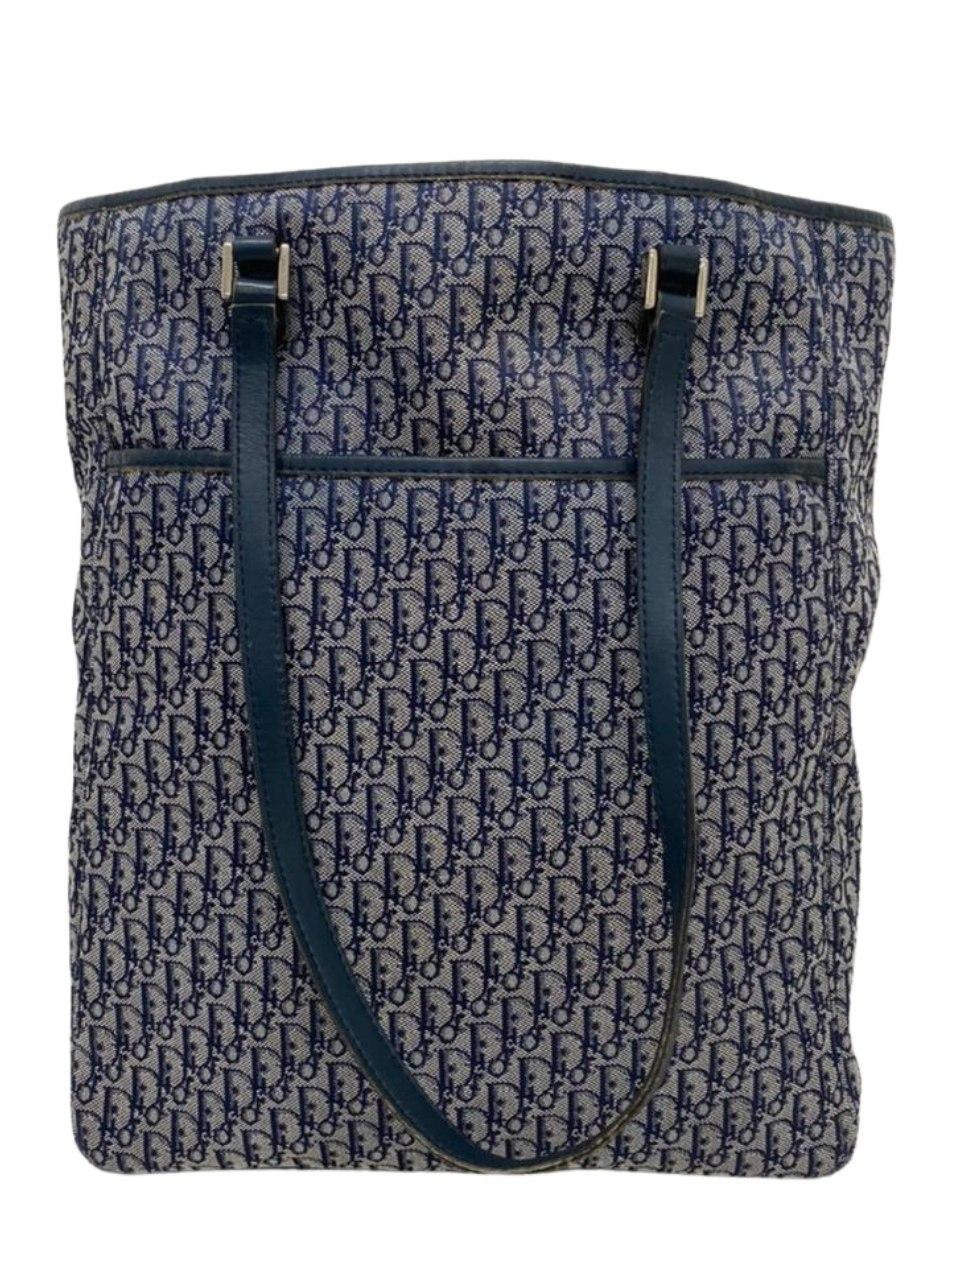 Bolsa Dior Vintage Oblique Jacquard